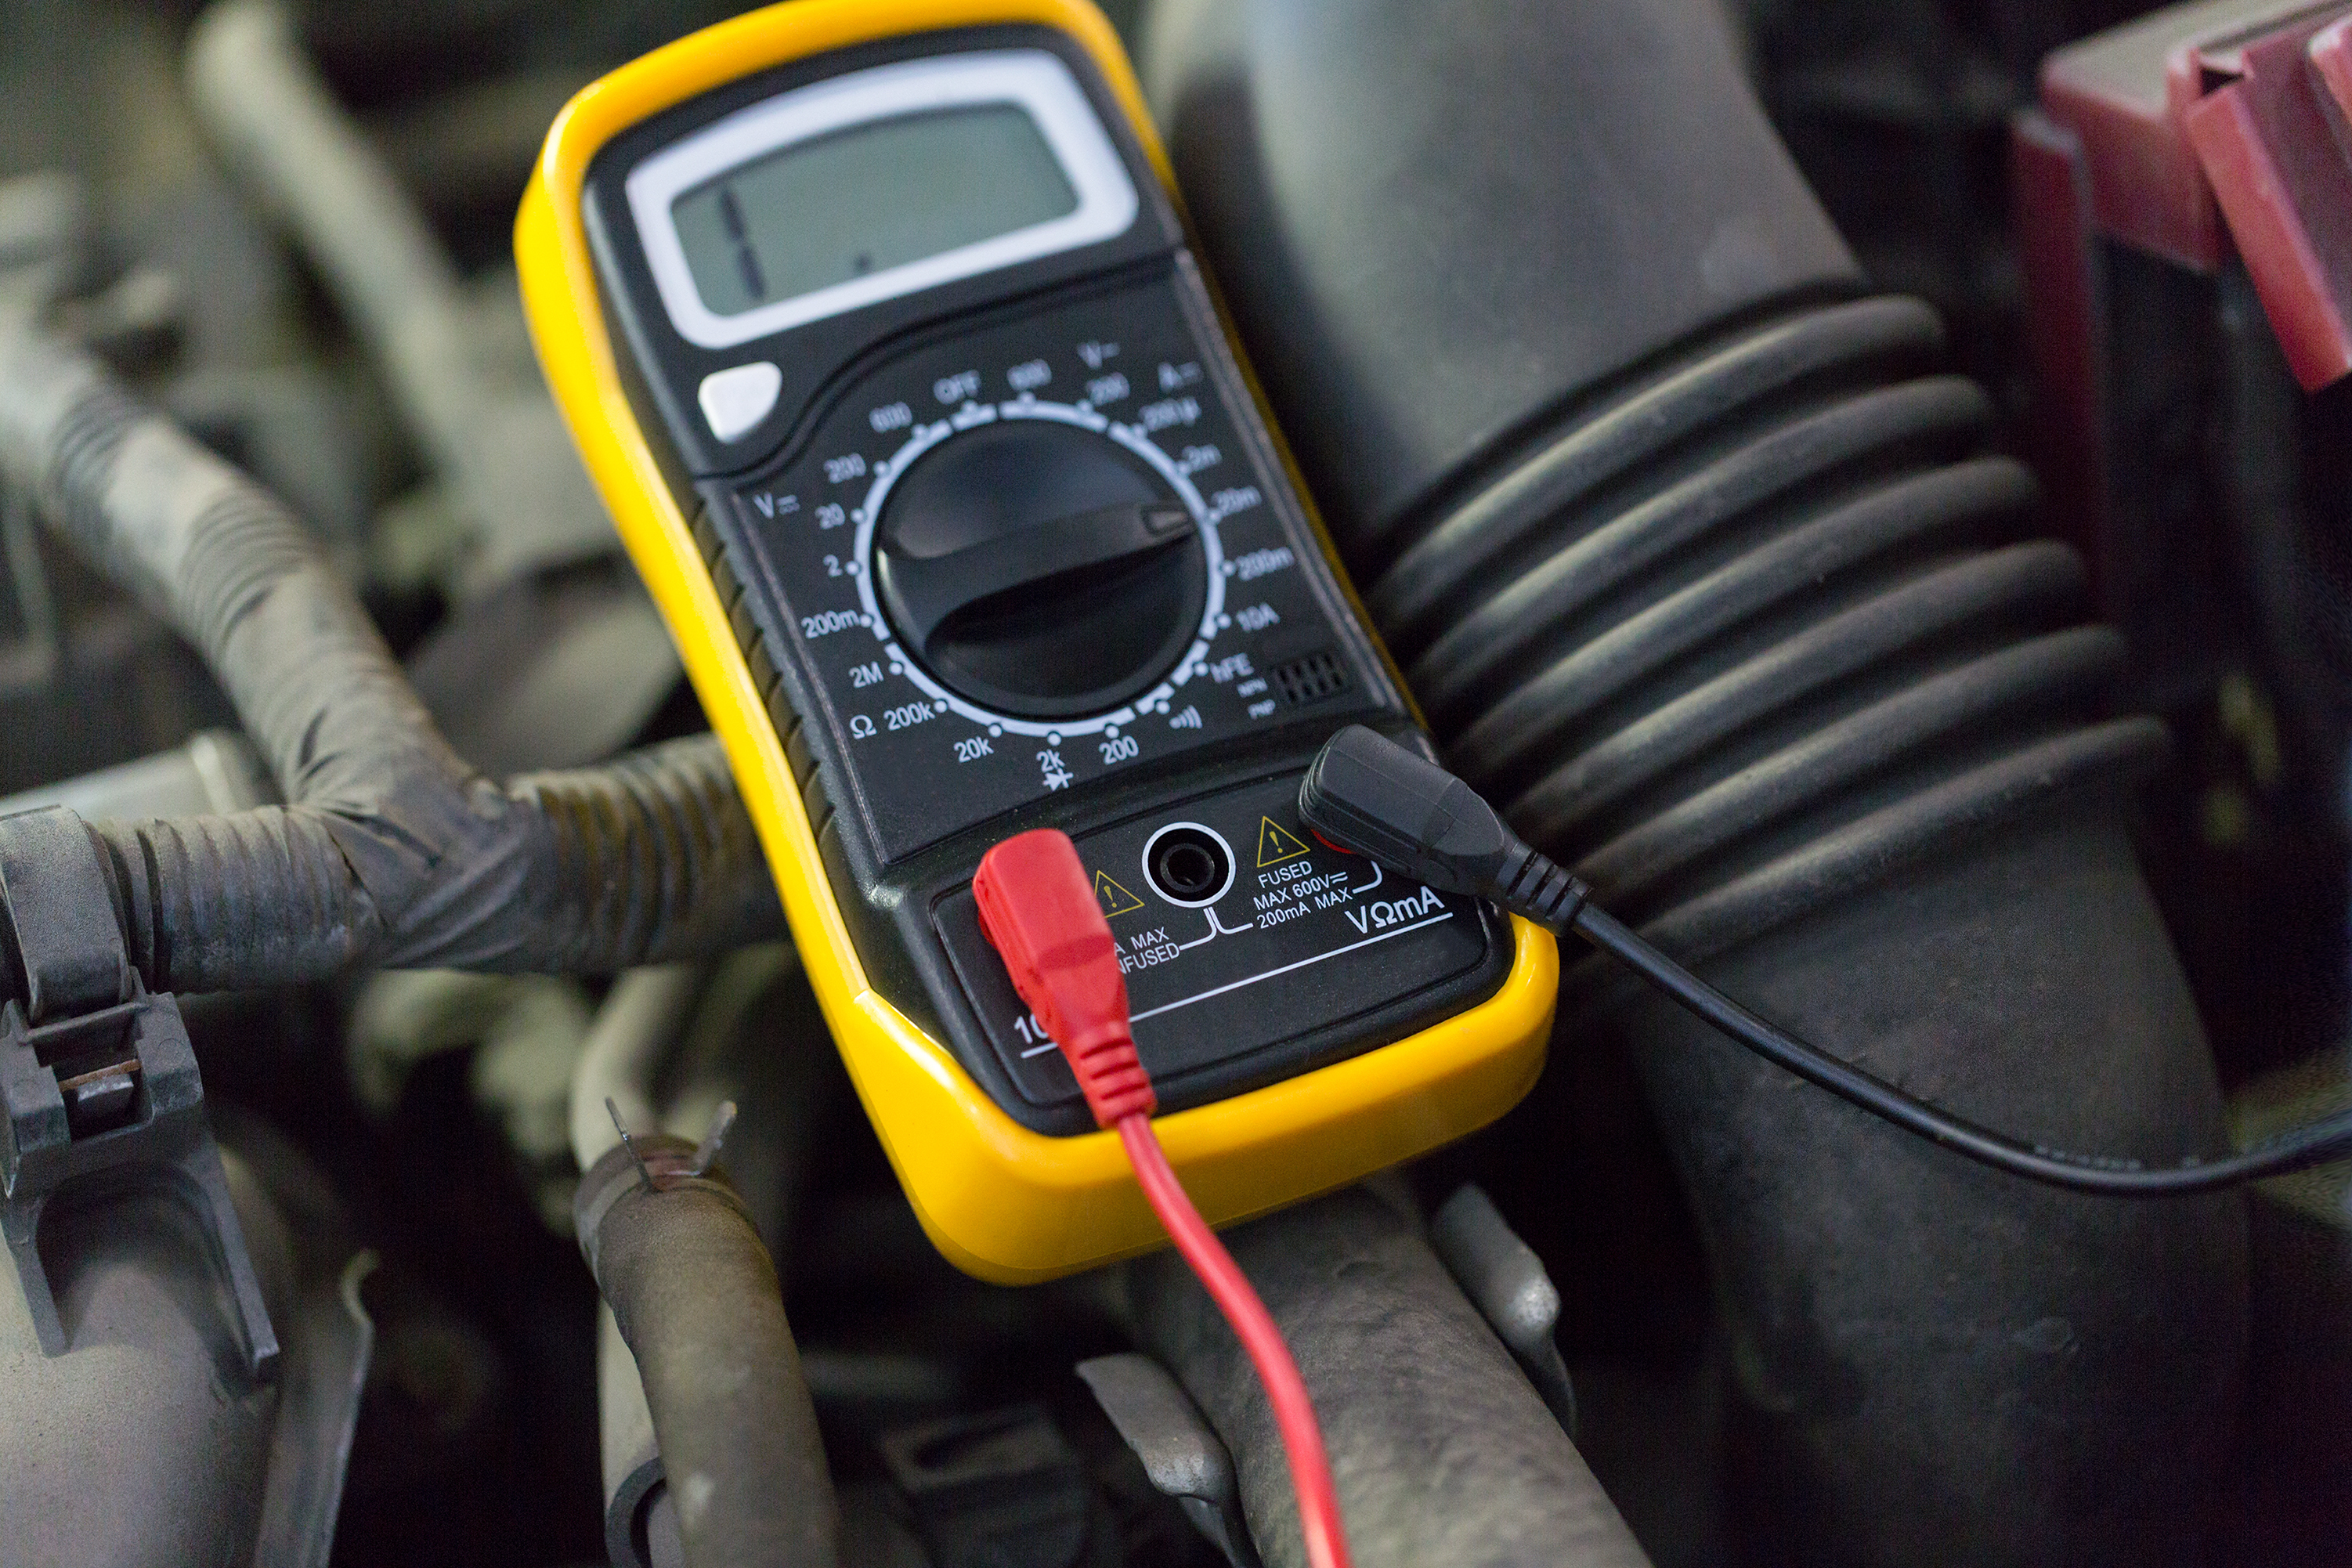 auto service, repair and maintenance con